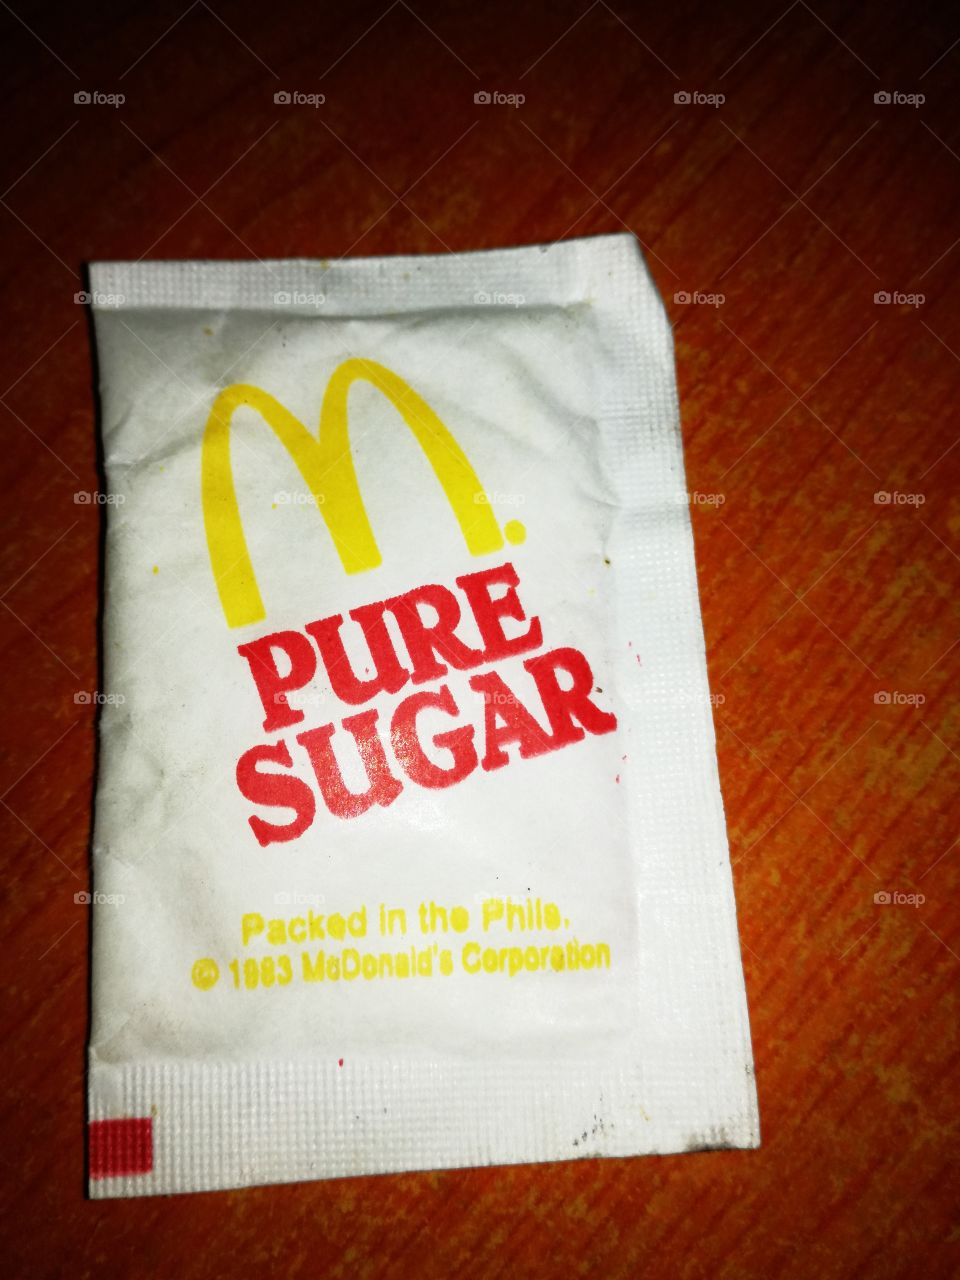 pure sugar from macdo, isn't it? 😅😂😅